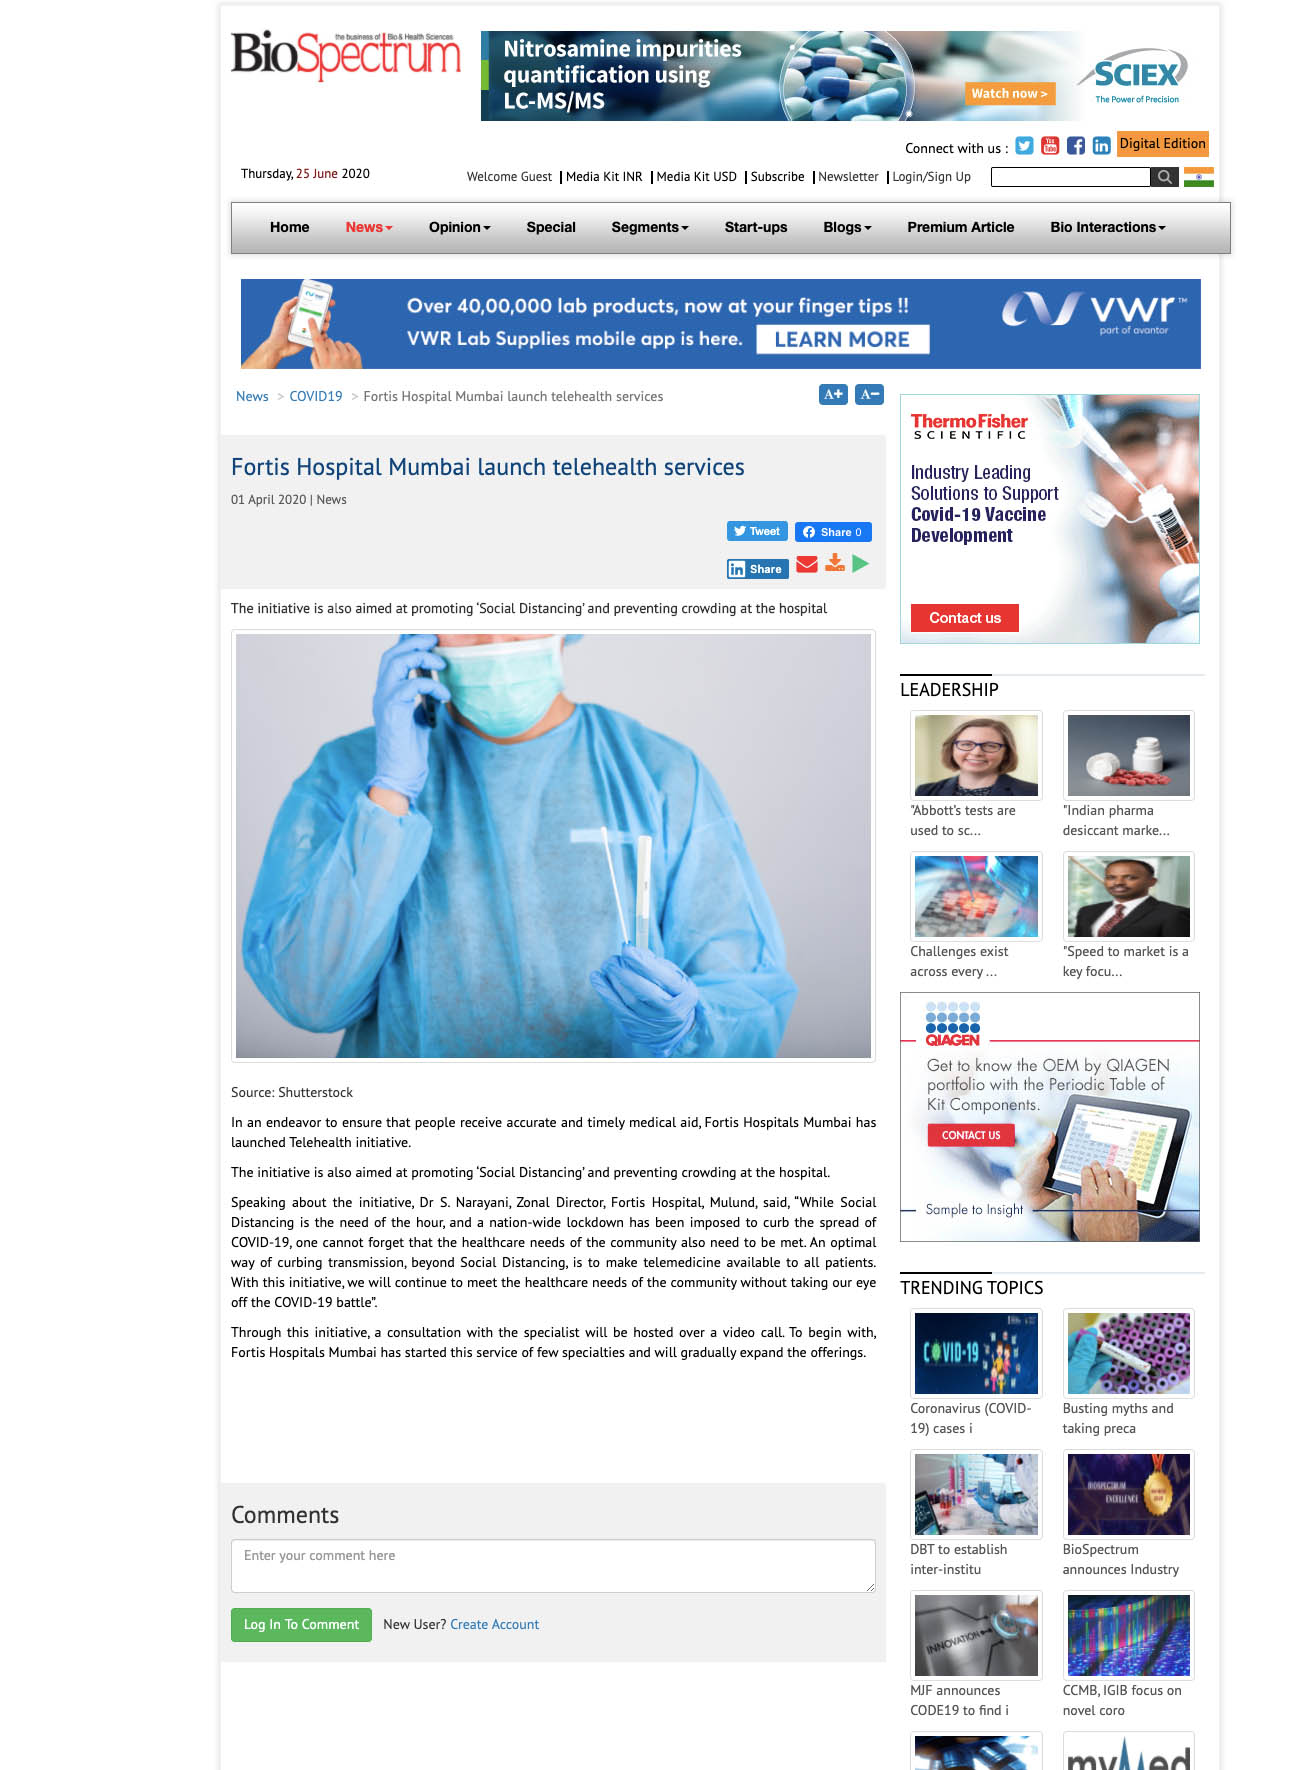 News - Fortis Hospital Mumbai Launch Telehealth Services